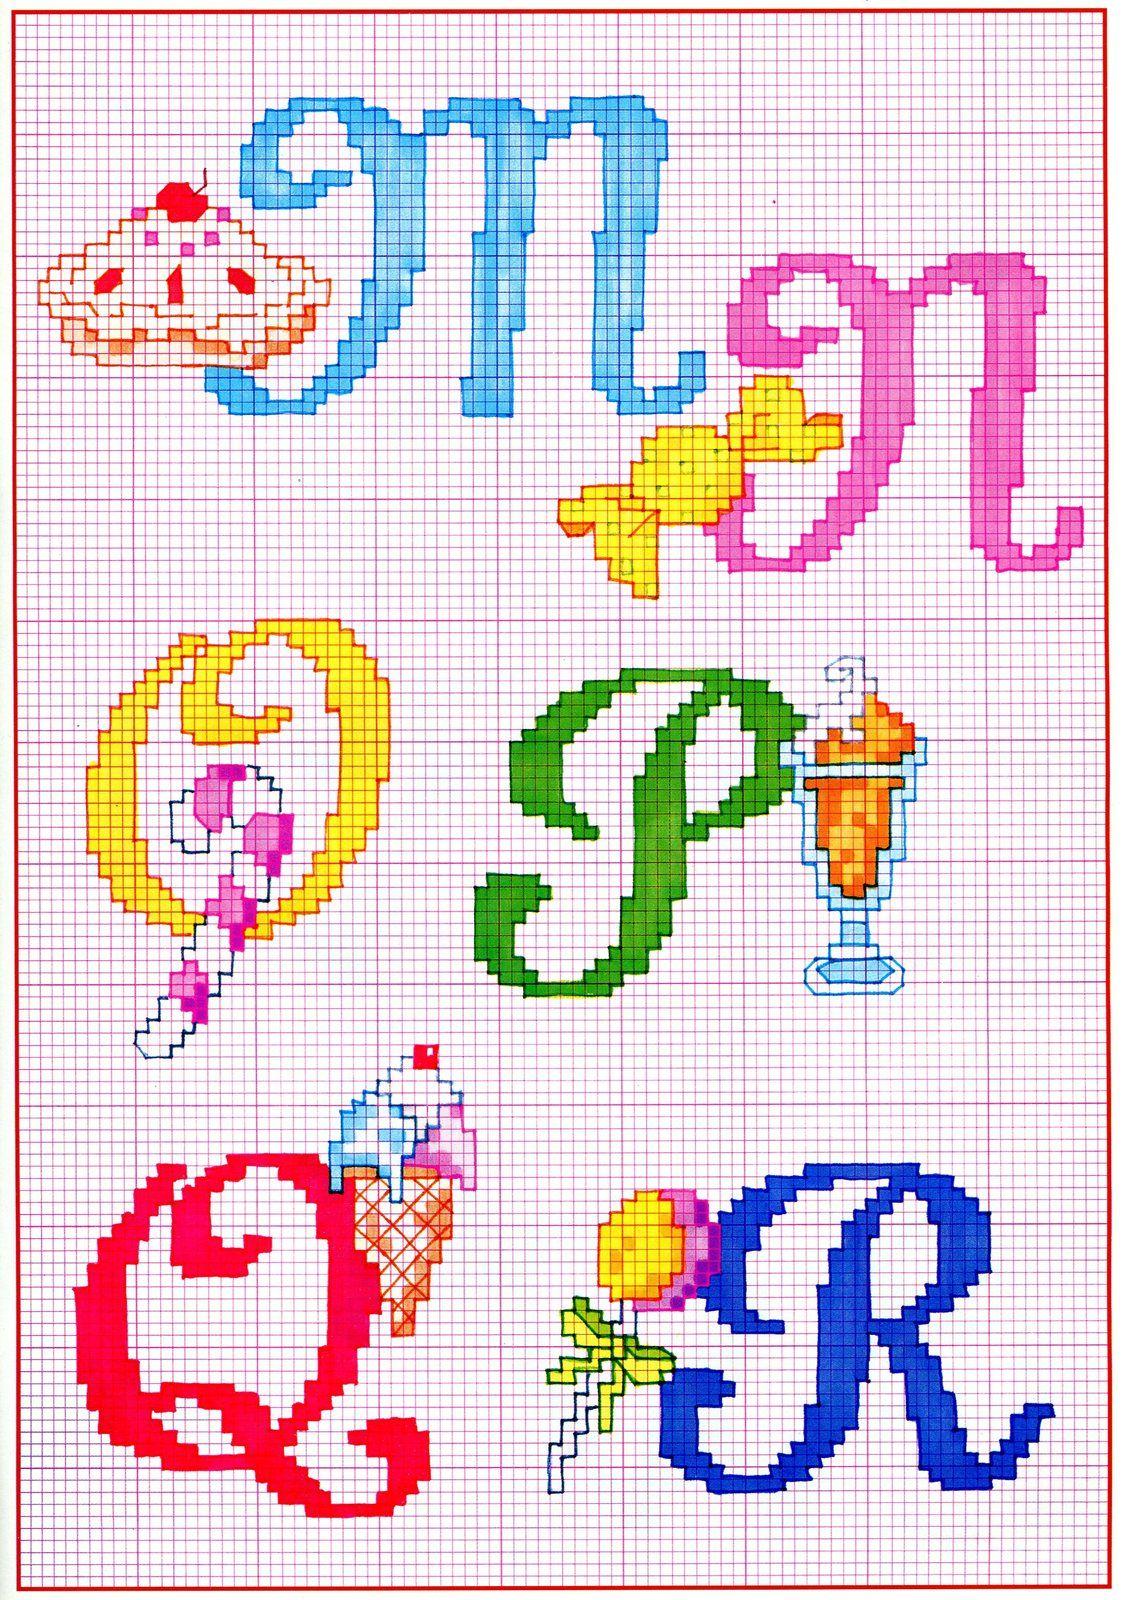 Sweets and fruit alphabet cross stitch patterns alfabeto punto croce